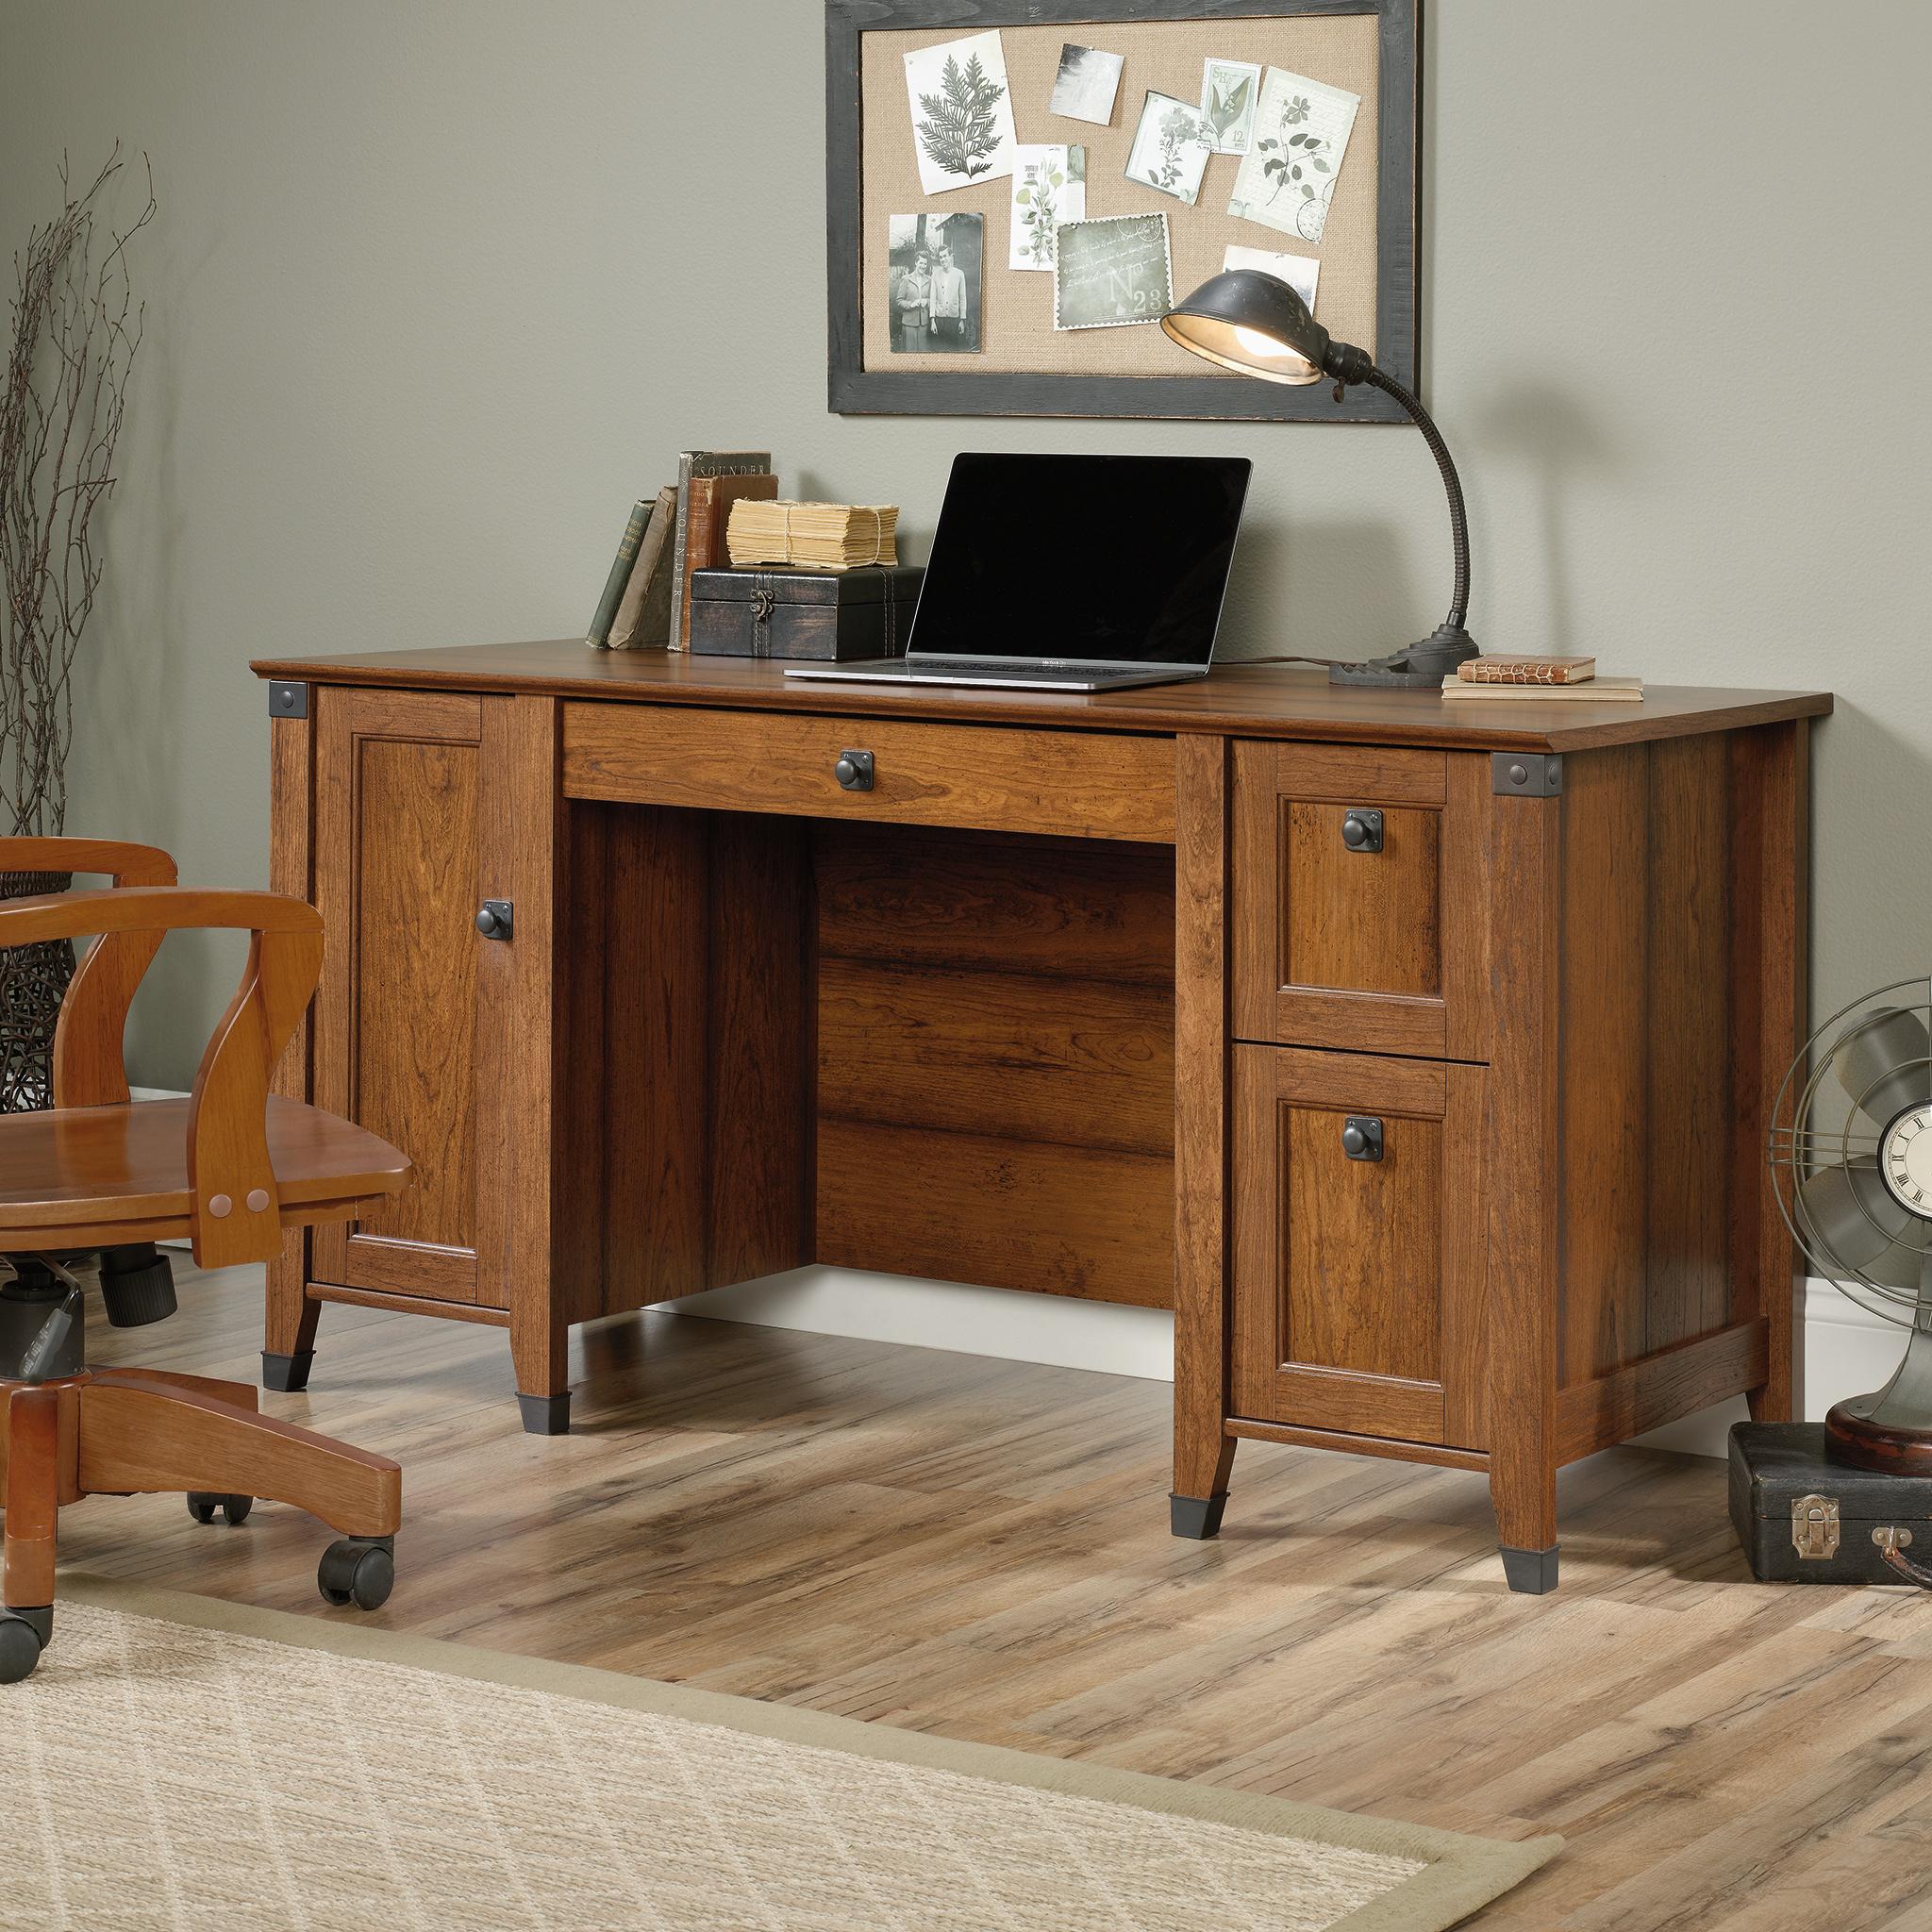 Sauder Carson Forge Computer Desk 422032  Sauder  The